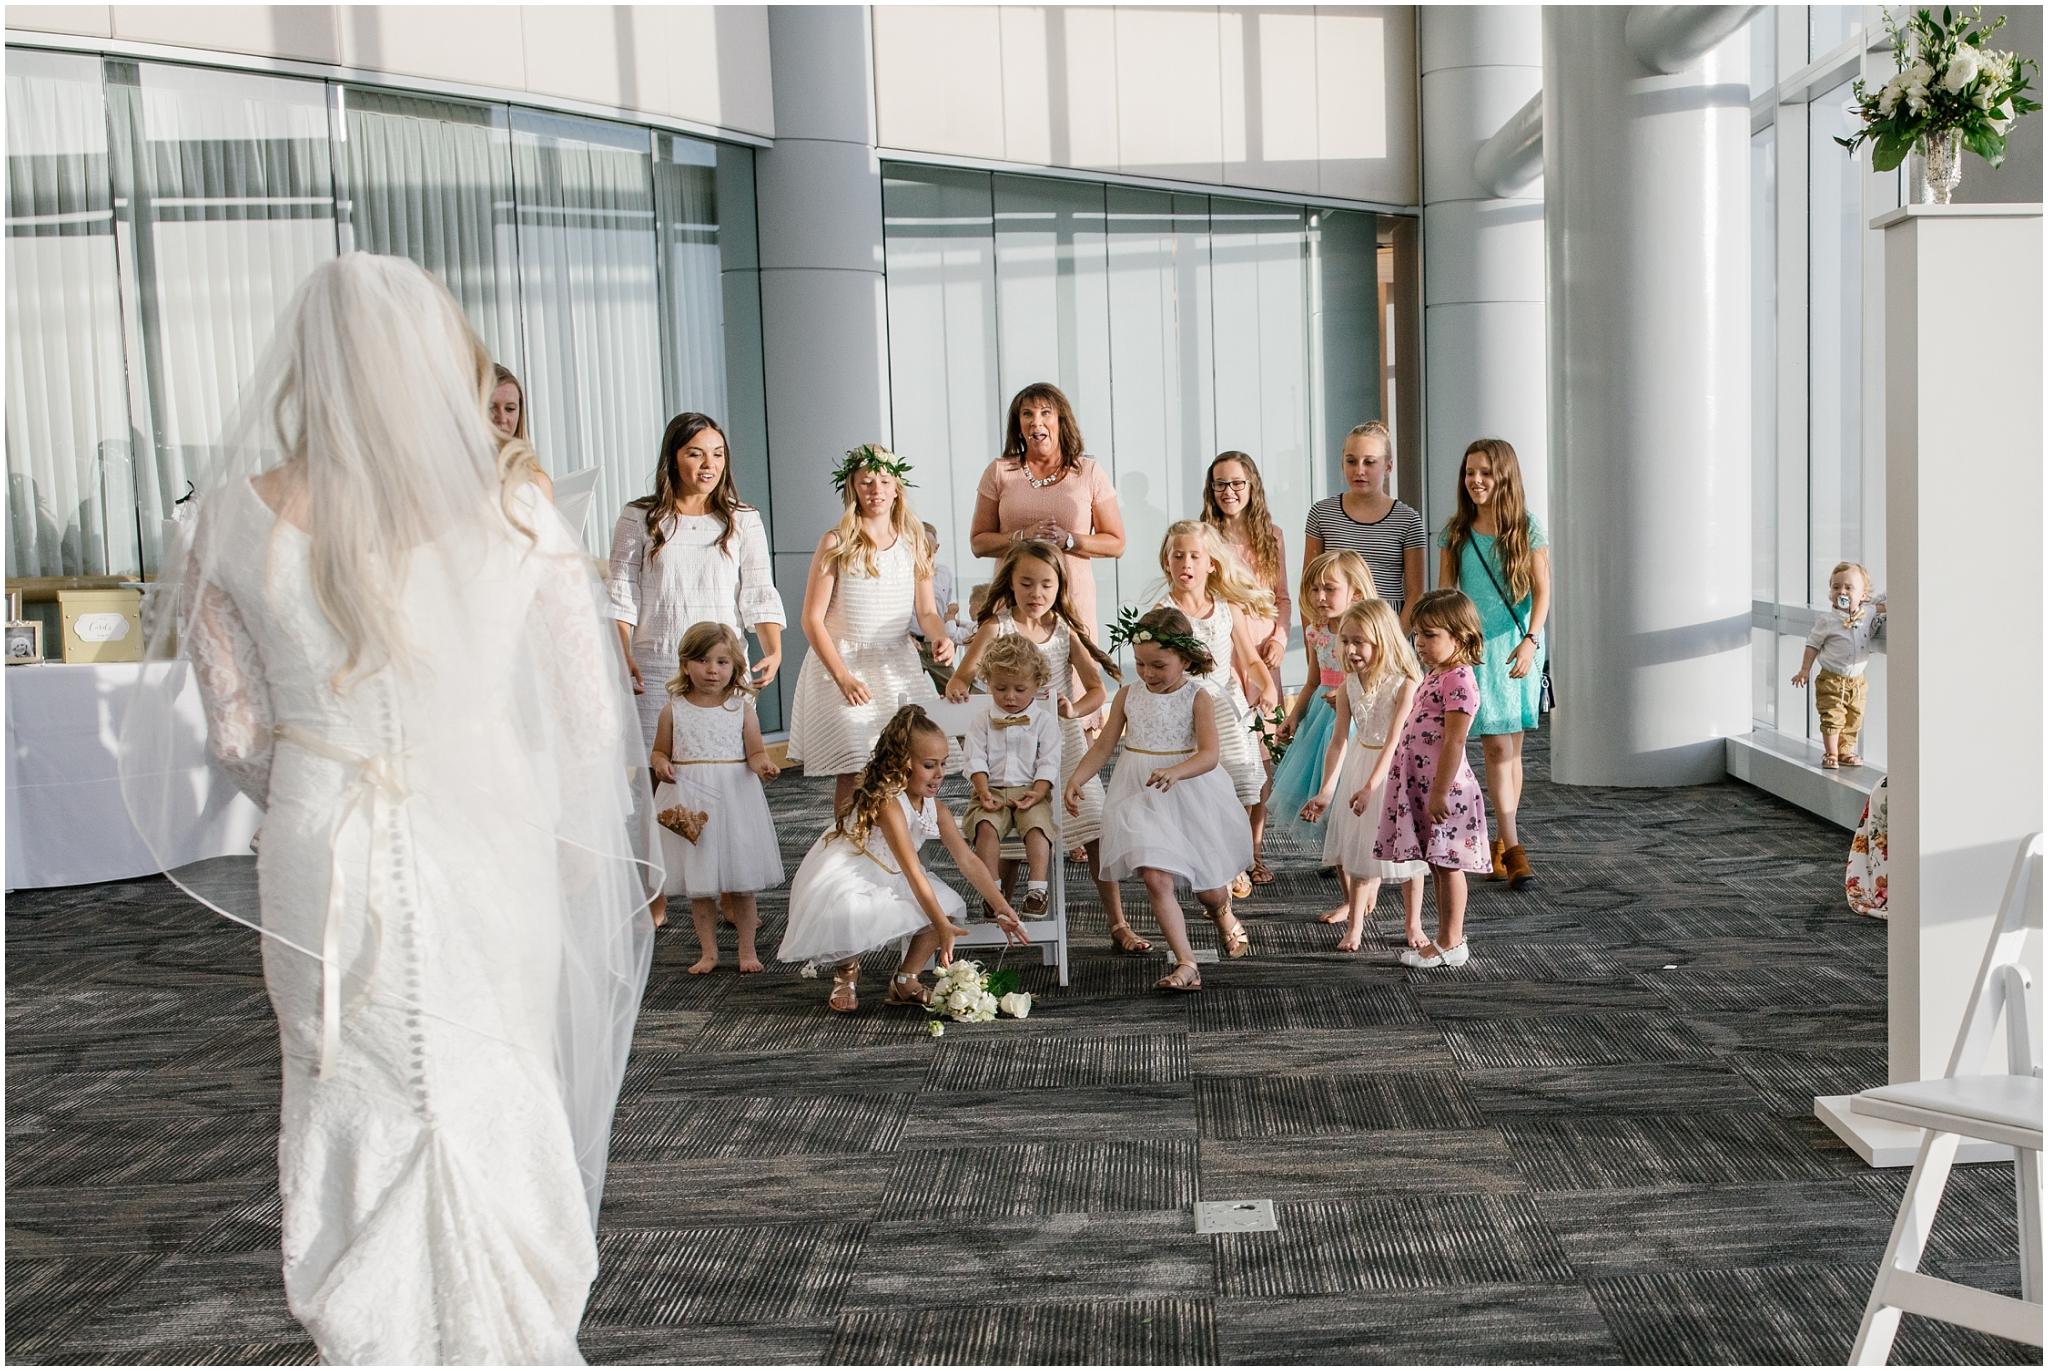 CherylandTyler-543_Lizzie-B-Imagery-Utah-Wedding-Photographer-Salt-Lake-City-Temple-Wells-Fargo-Building-Reception.jpg